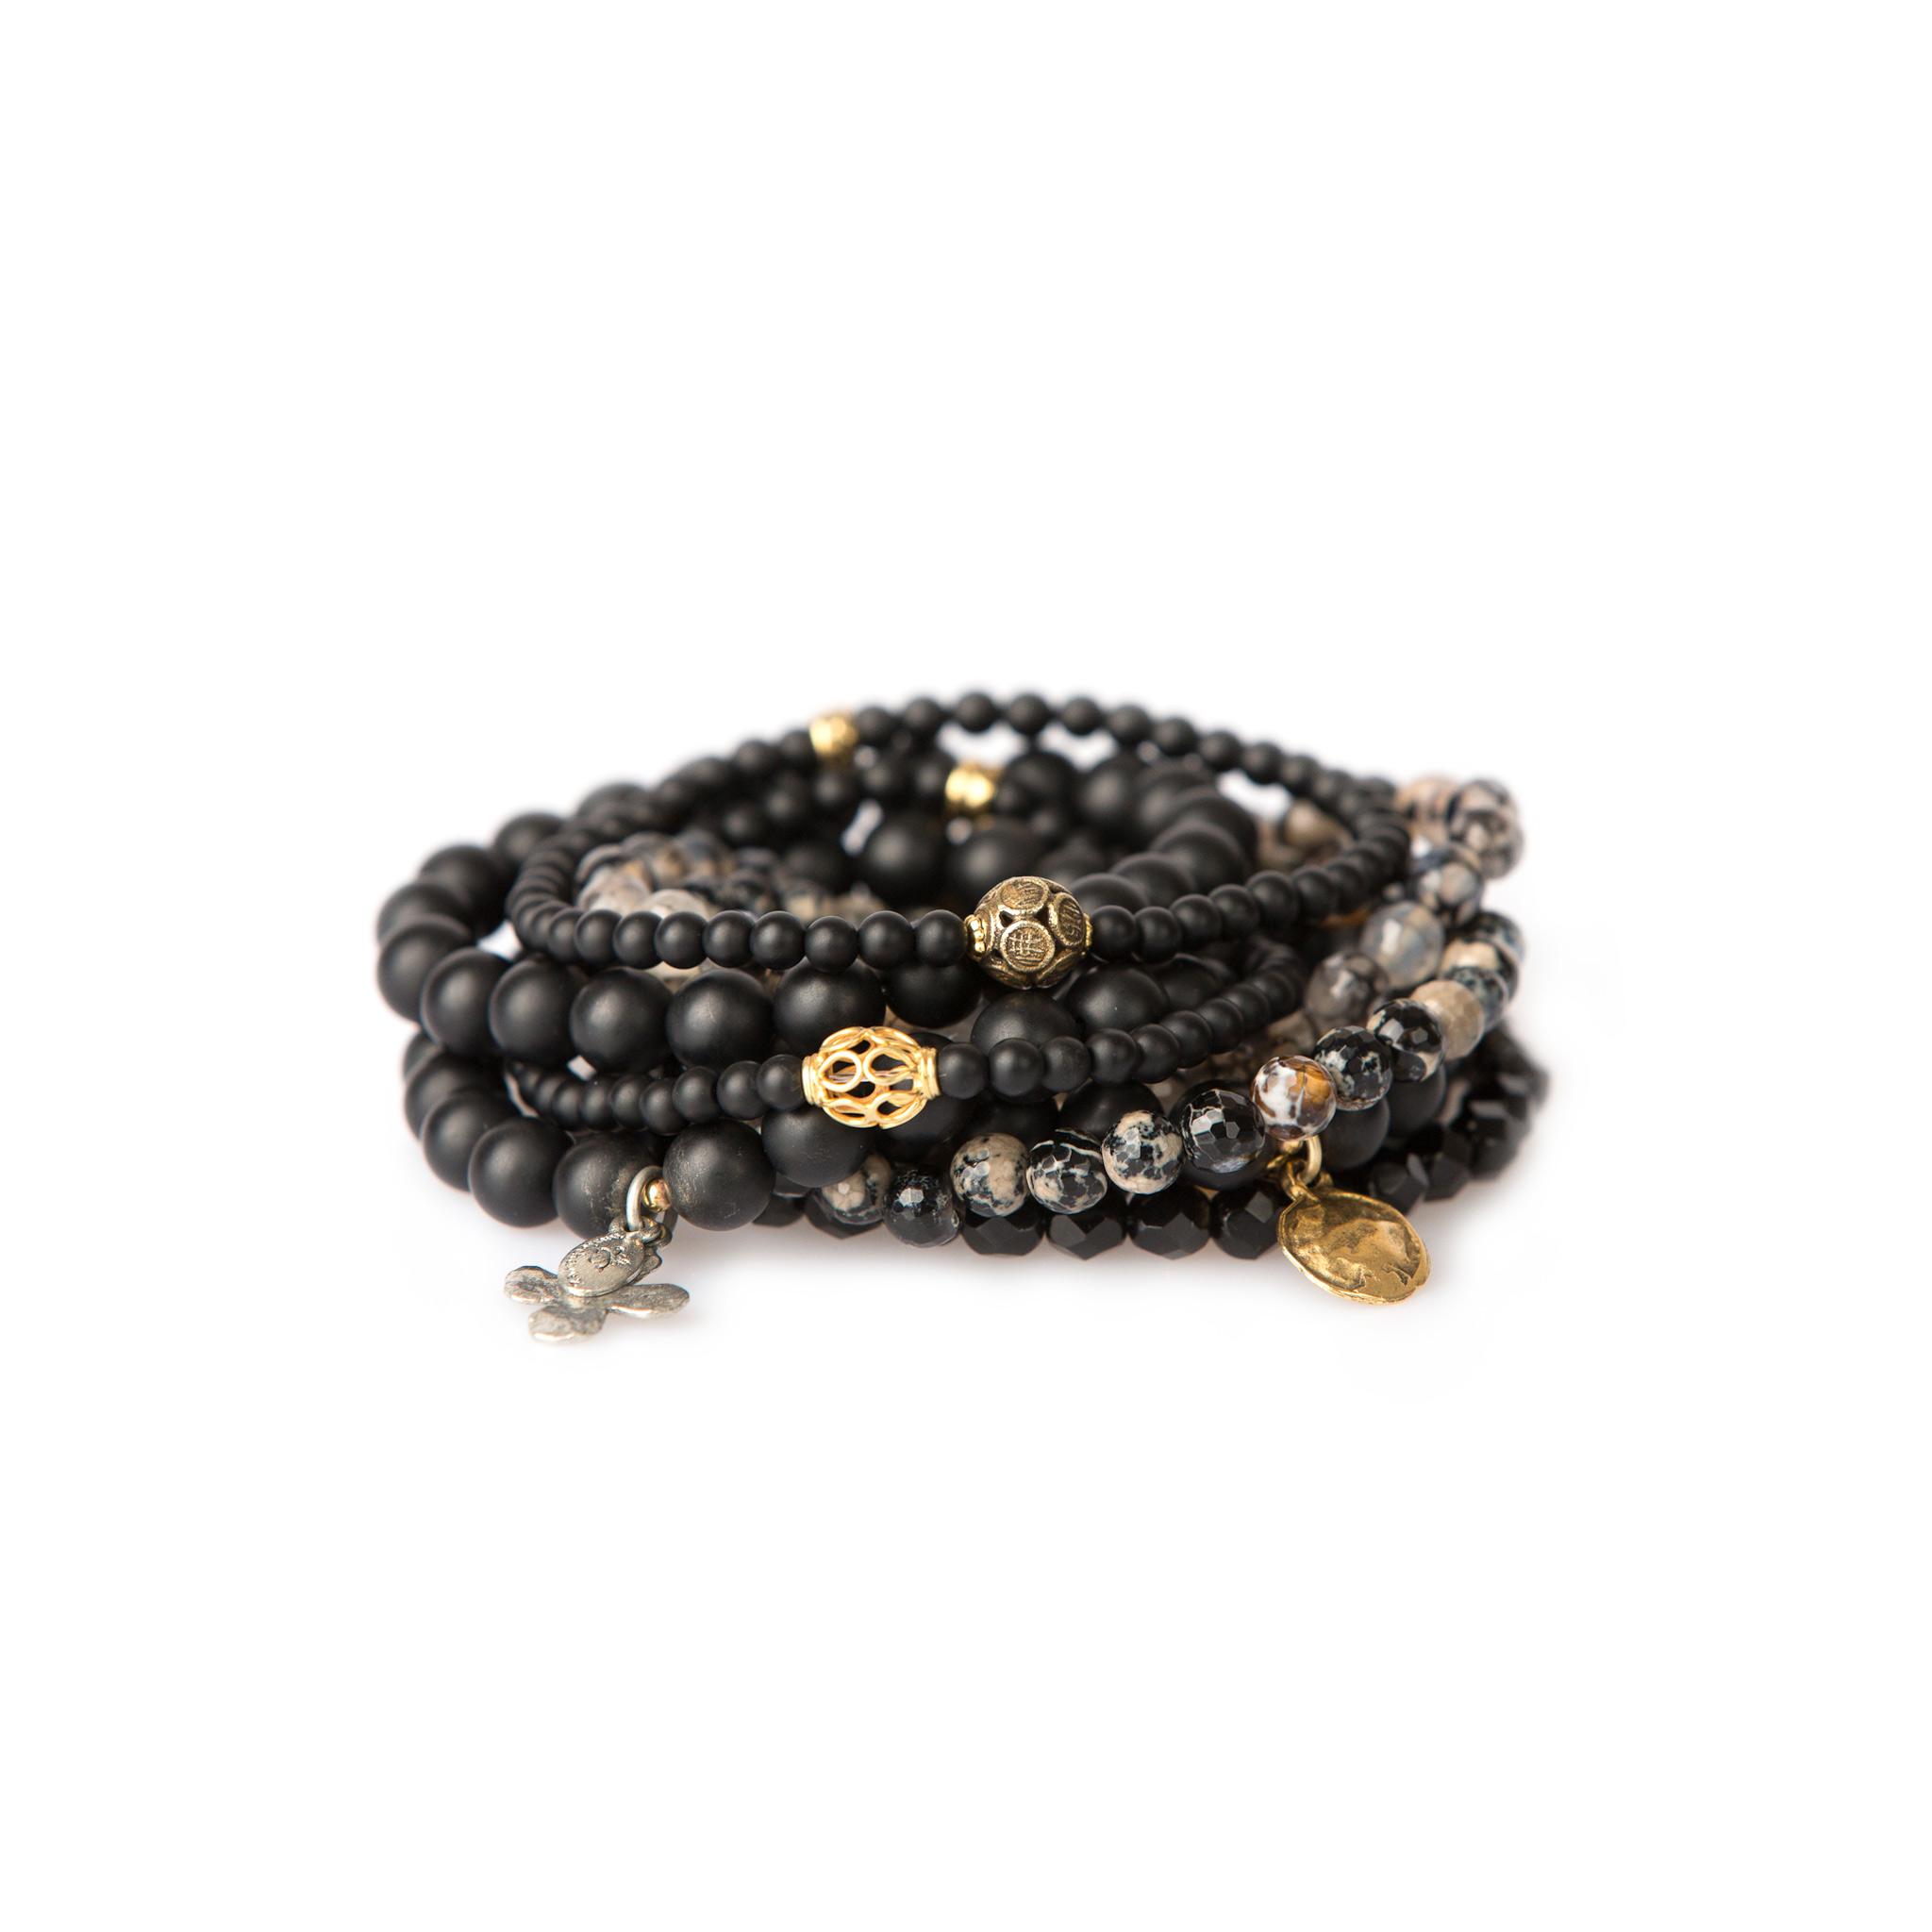 accessorize for charity at a unique bracelet bar event